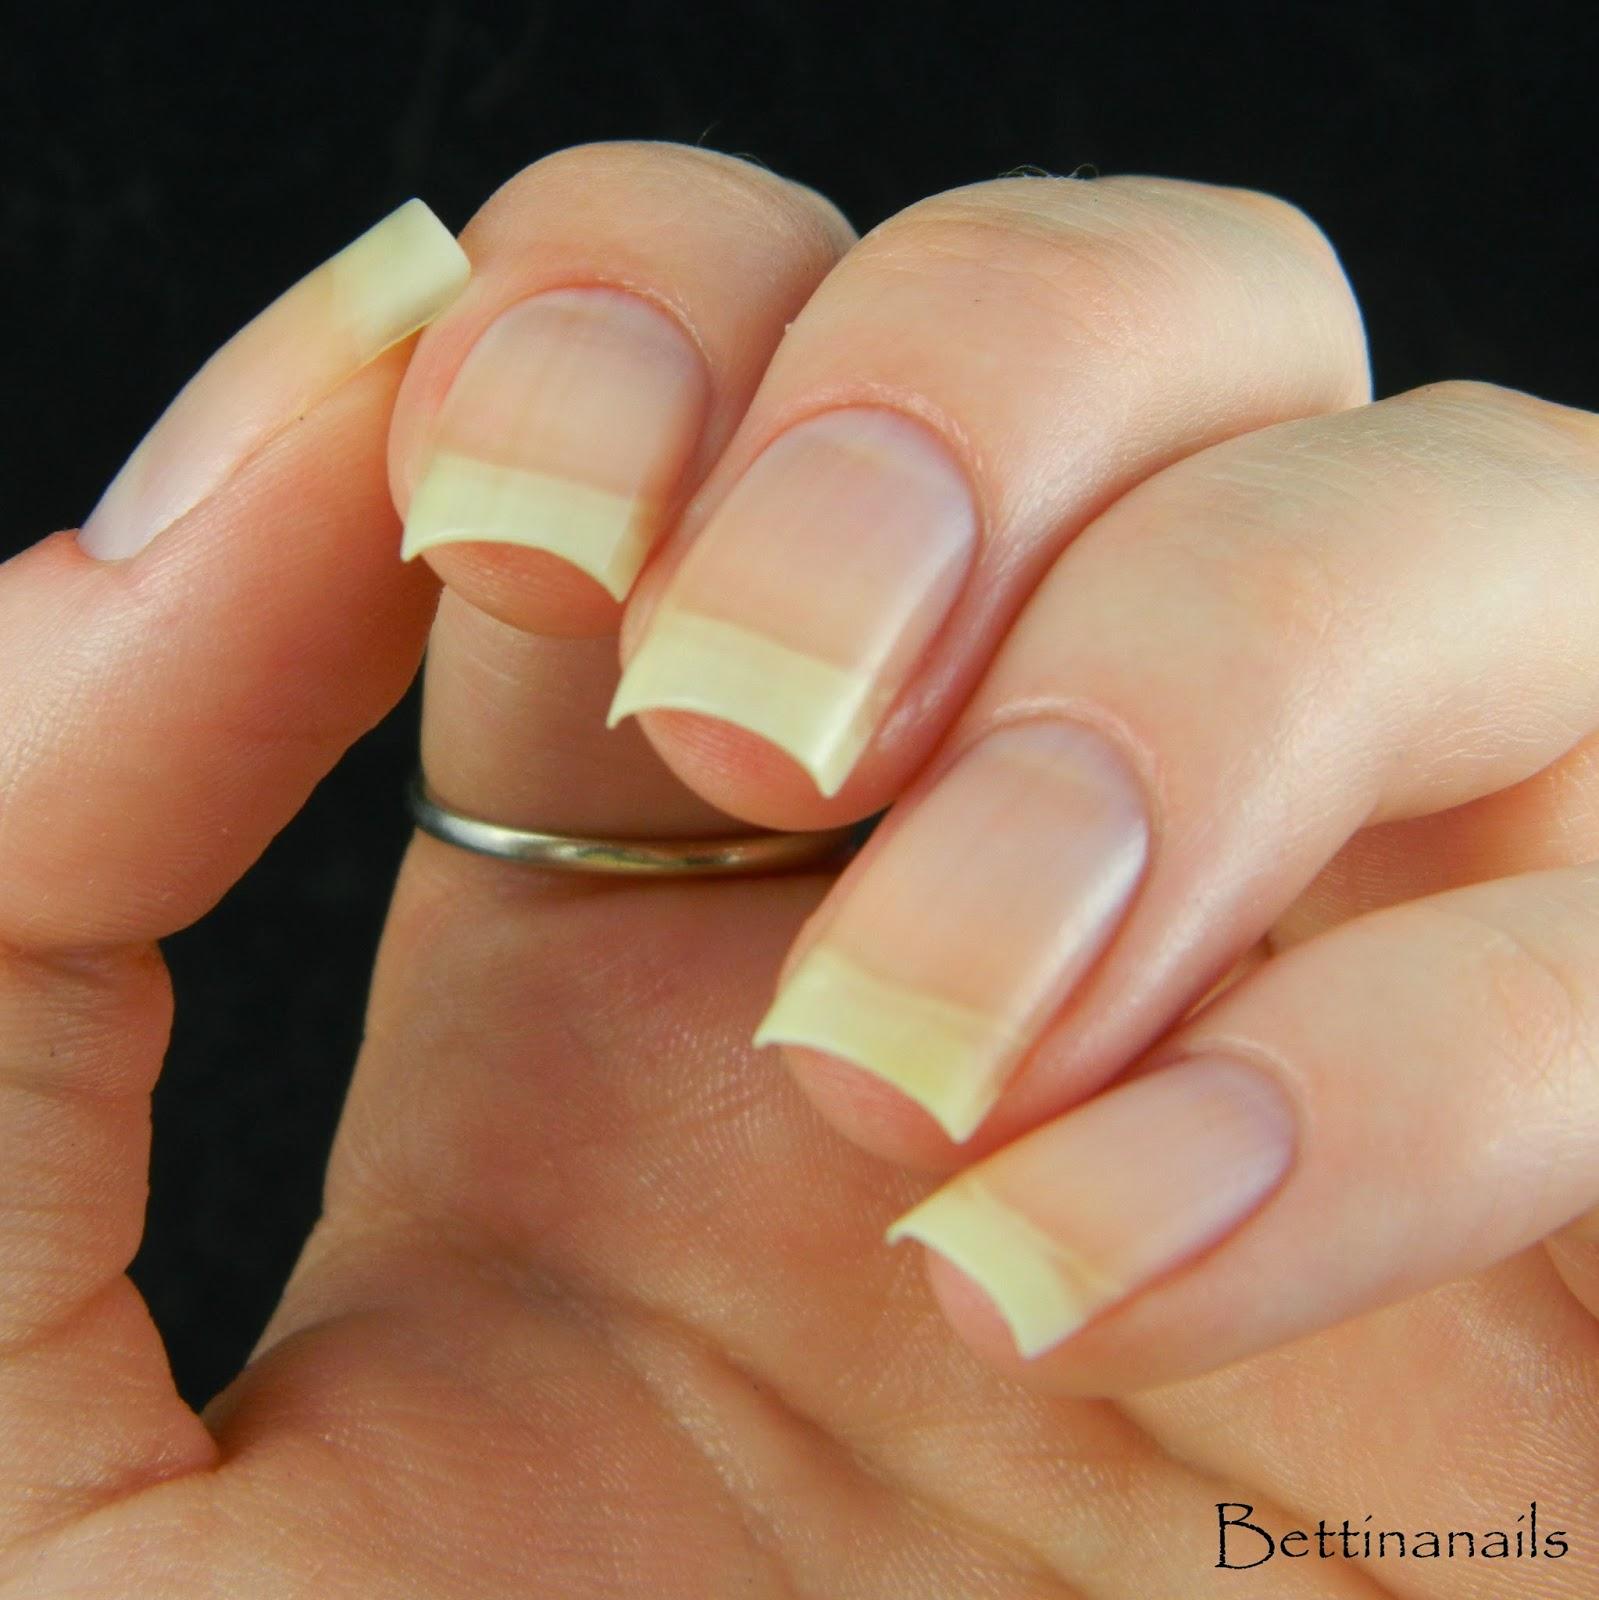 Bettina Nails My Nail Care Routine